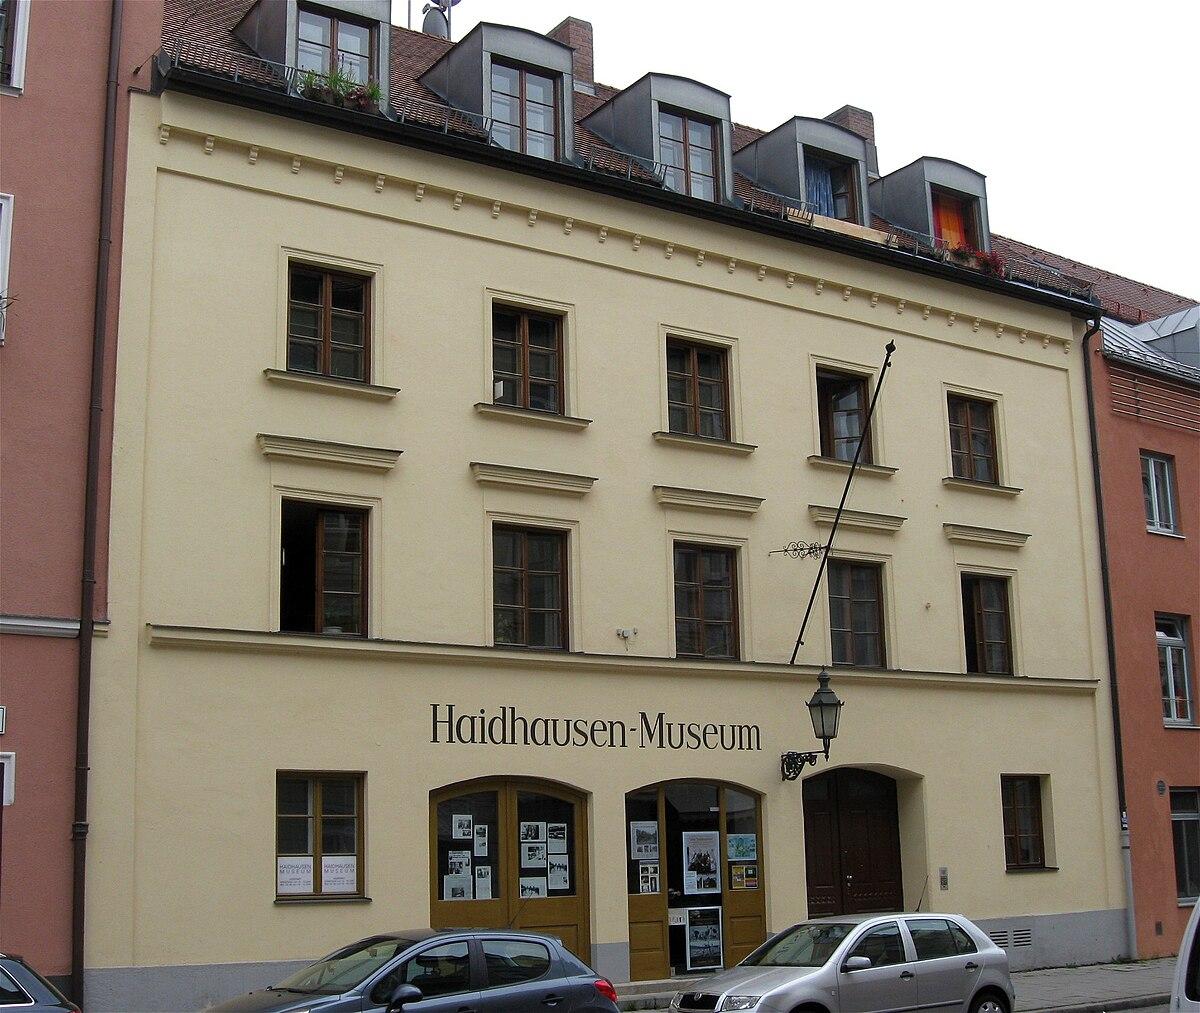 Kino Haidhausen